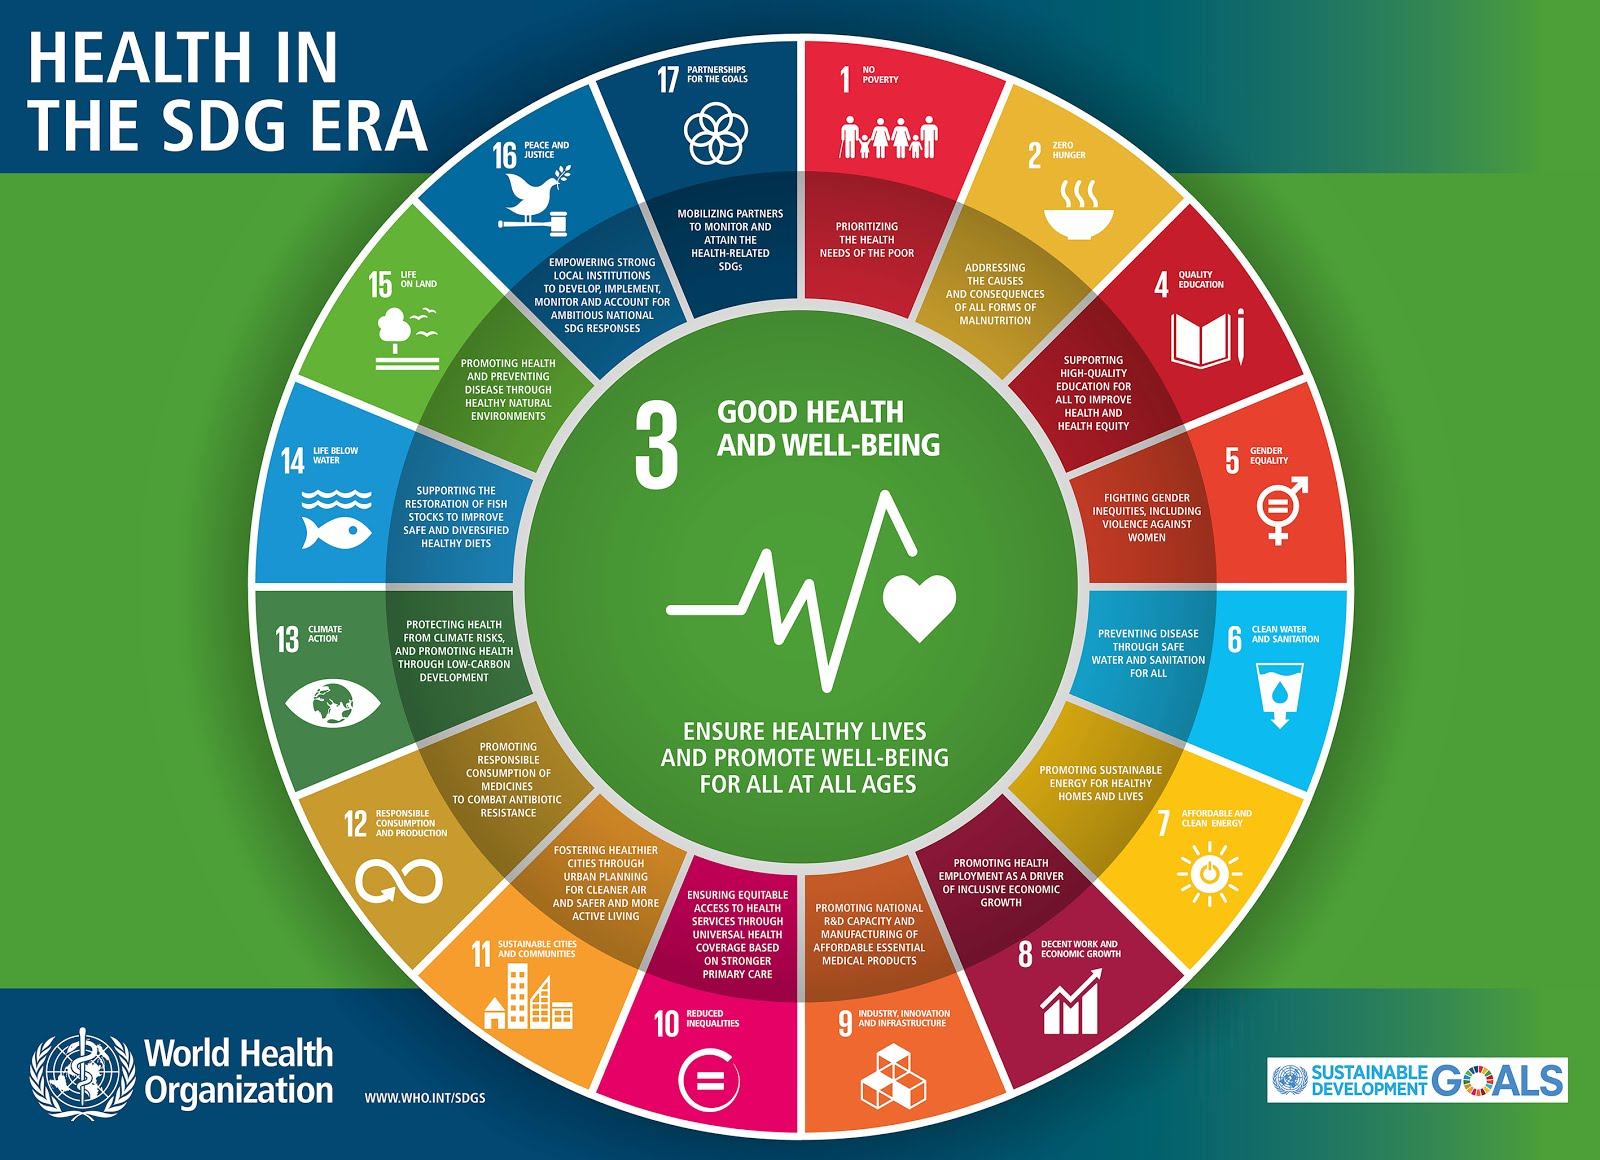 UNSDG: Health